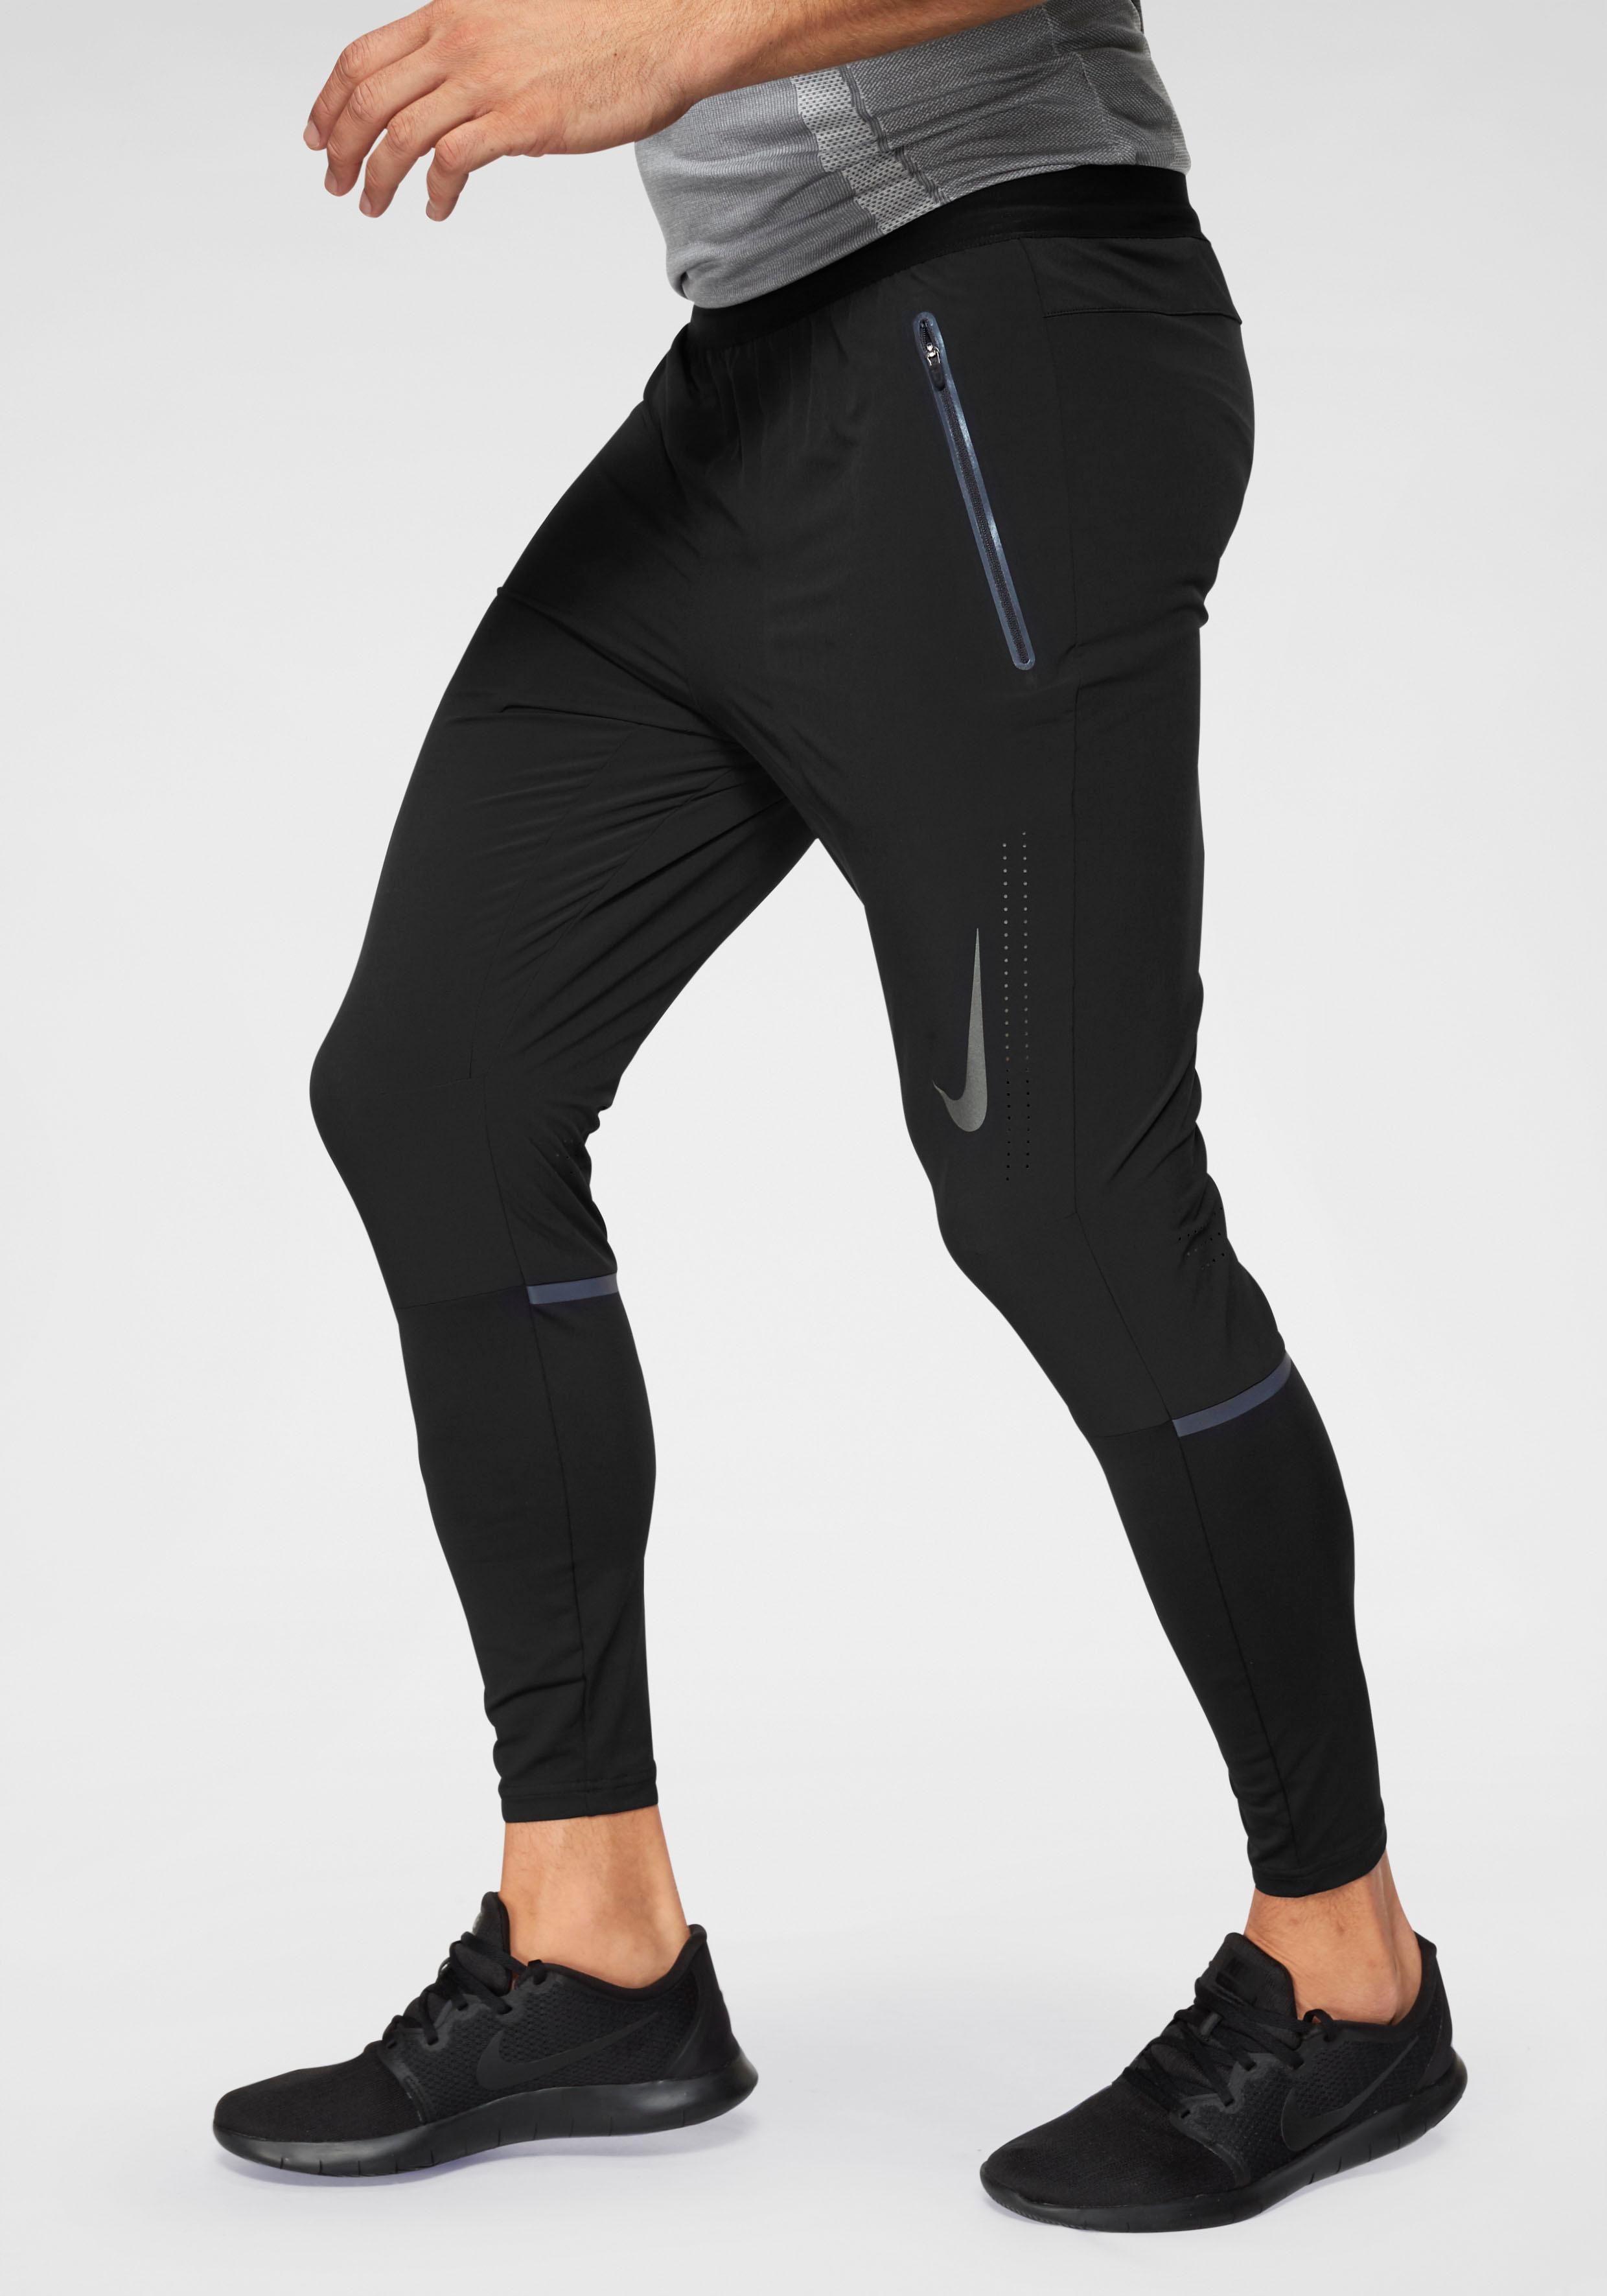 Nike Laufhose M NK SWIFT RUN PANT | Sportbekleidung > Sporthosen > Laufhosen | Nike